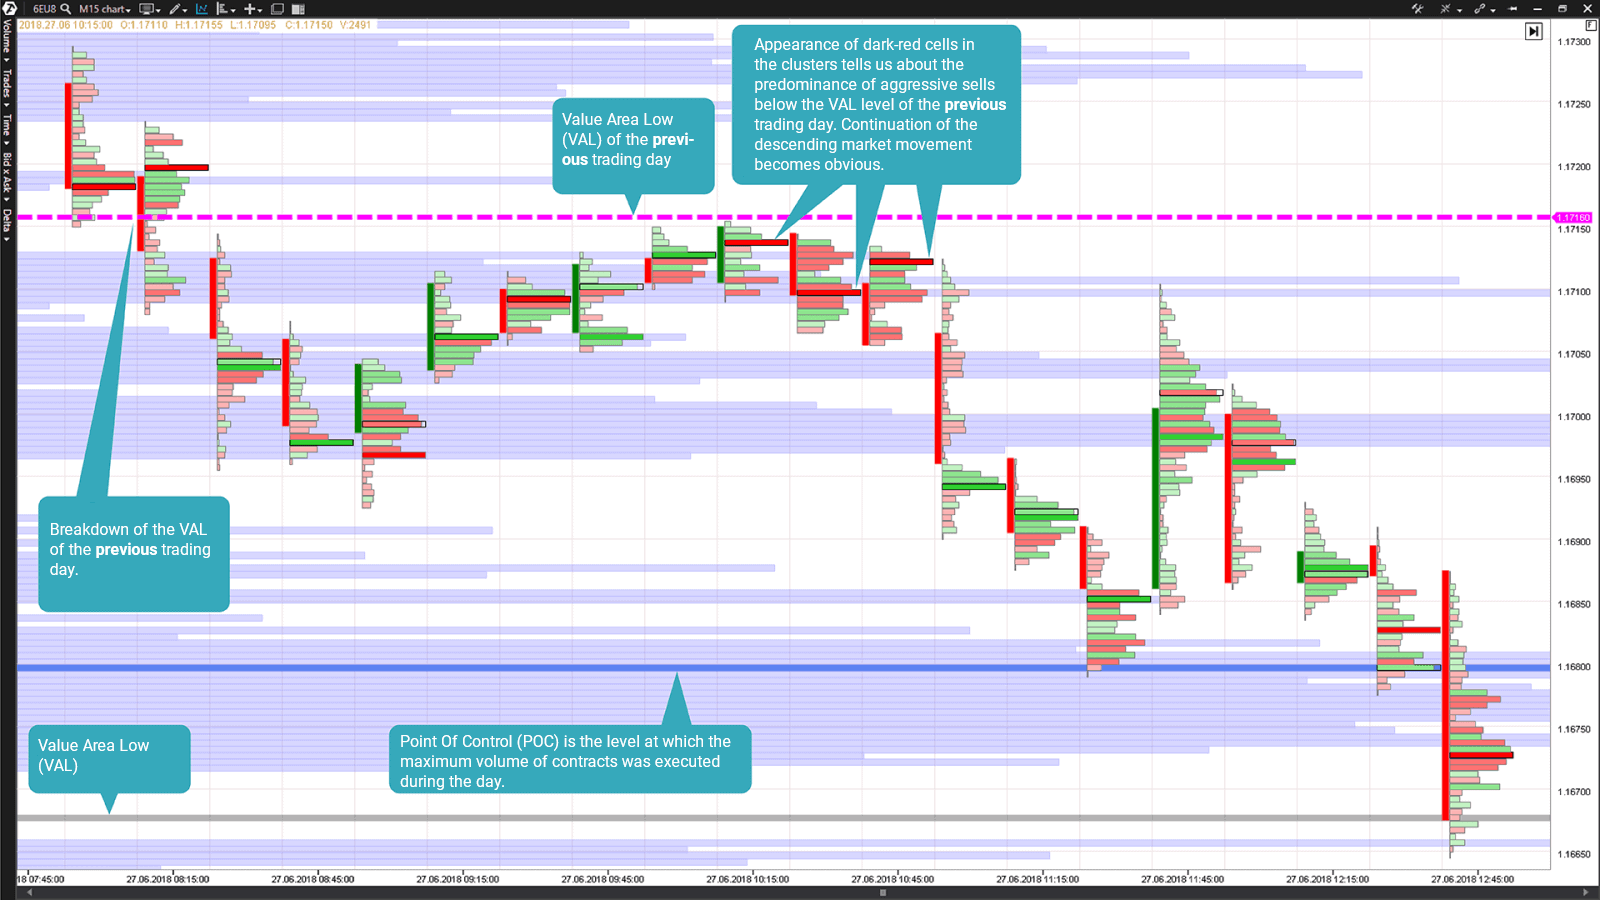 The Bid x Ask footprint chart of the ATAS platform